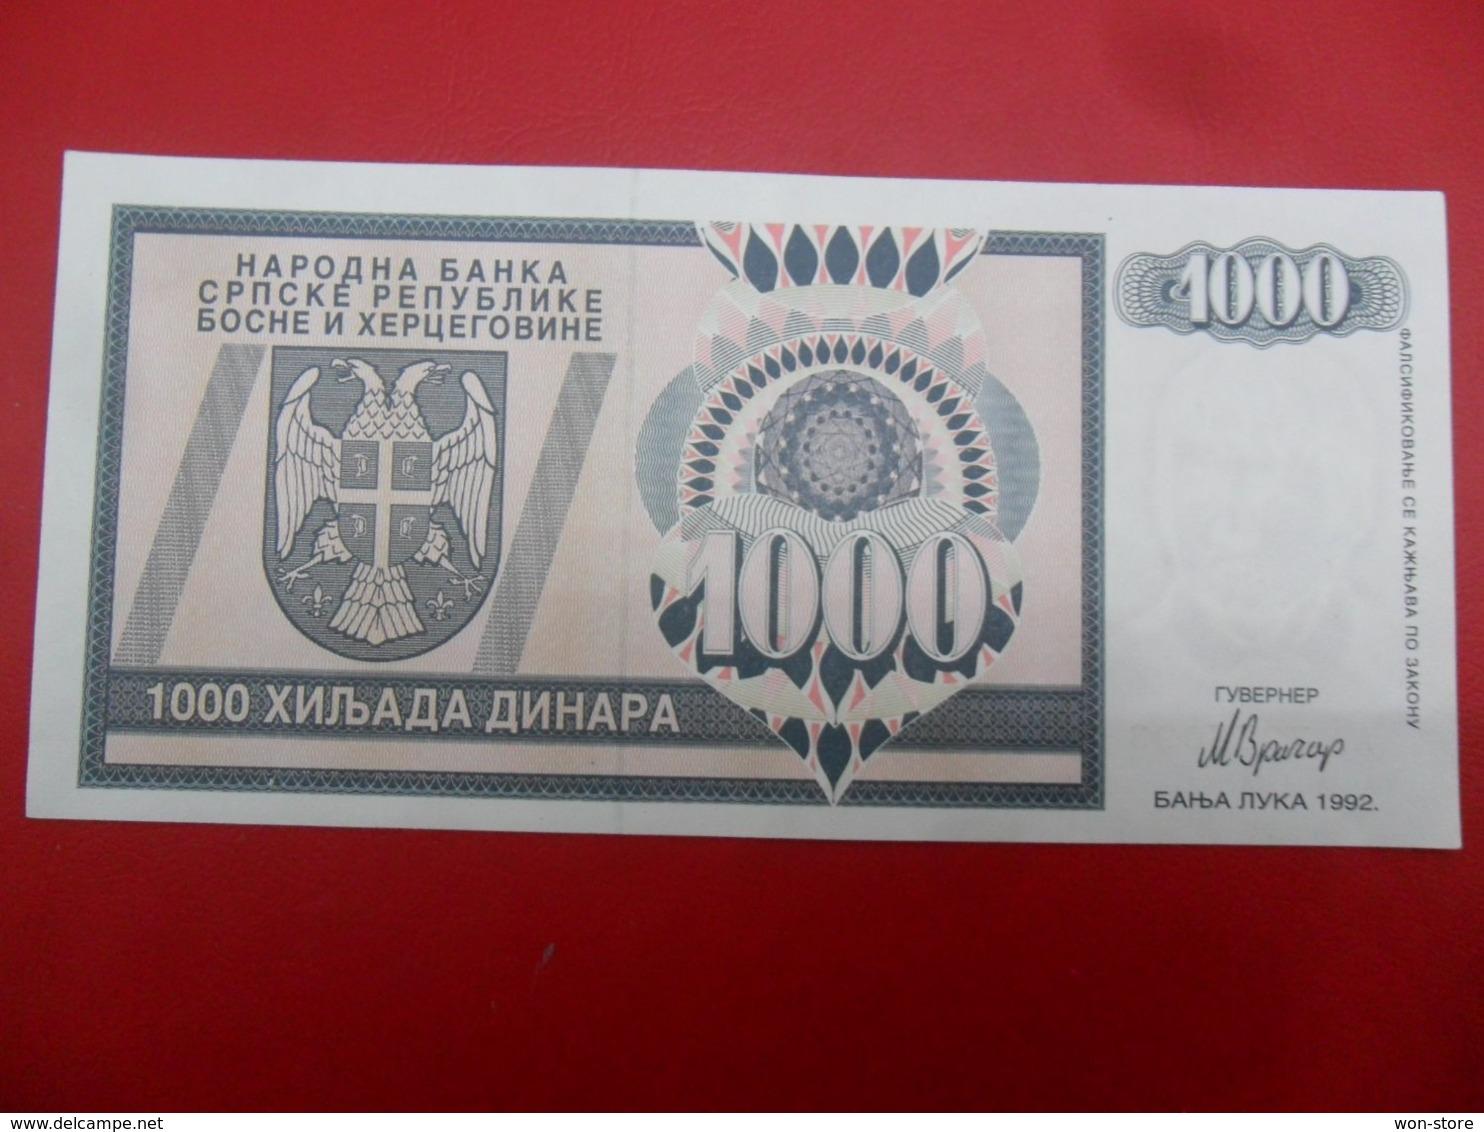 NB Republika Bosna I Hercegovina - Bosnia And Herzegovina 1000 Dinara 1992, P-137a, Price For 1 Pcs - Bosnia And Herzegovina